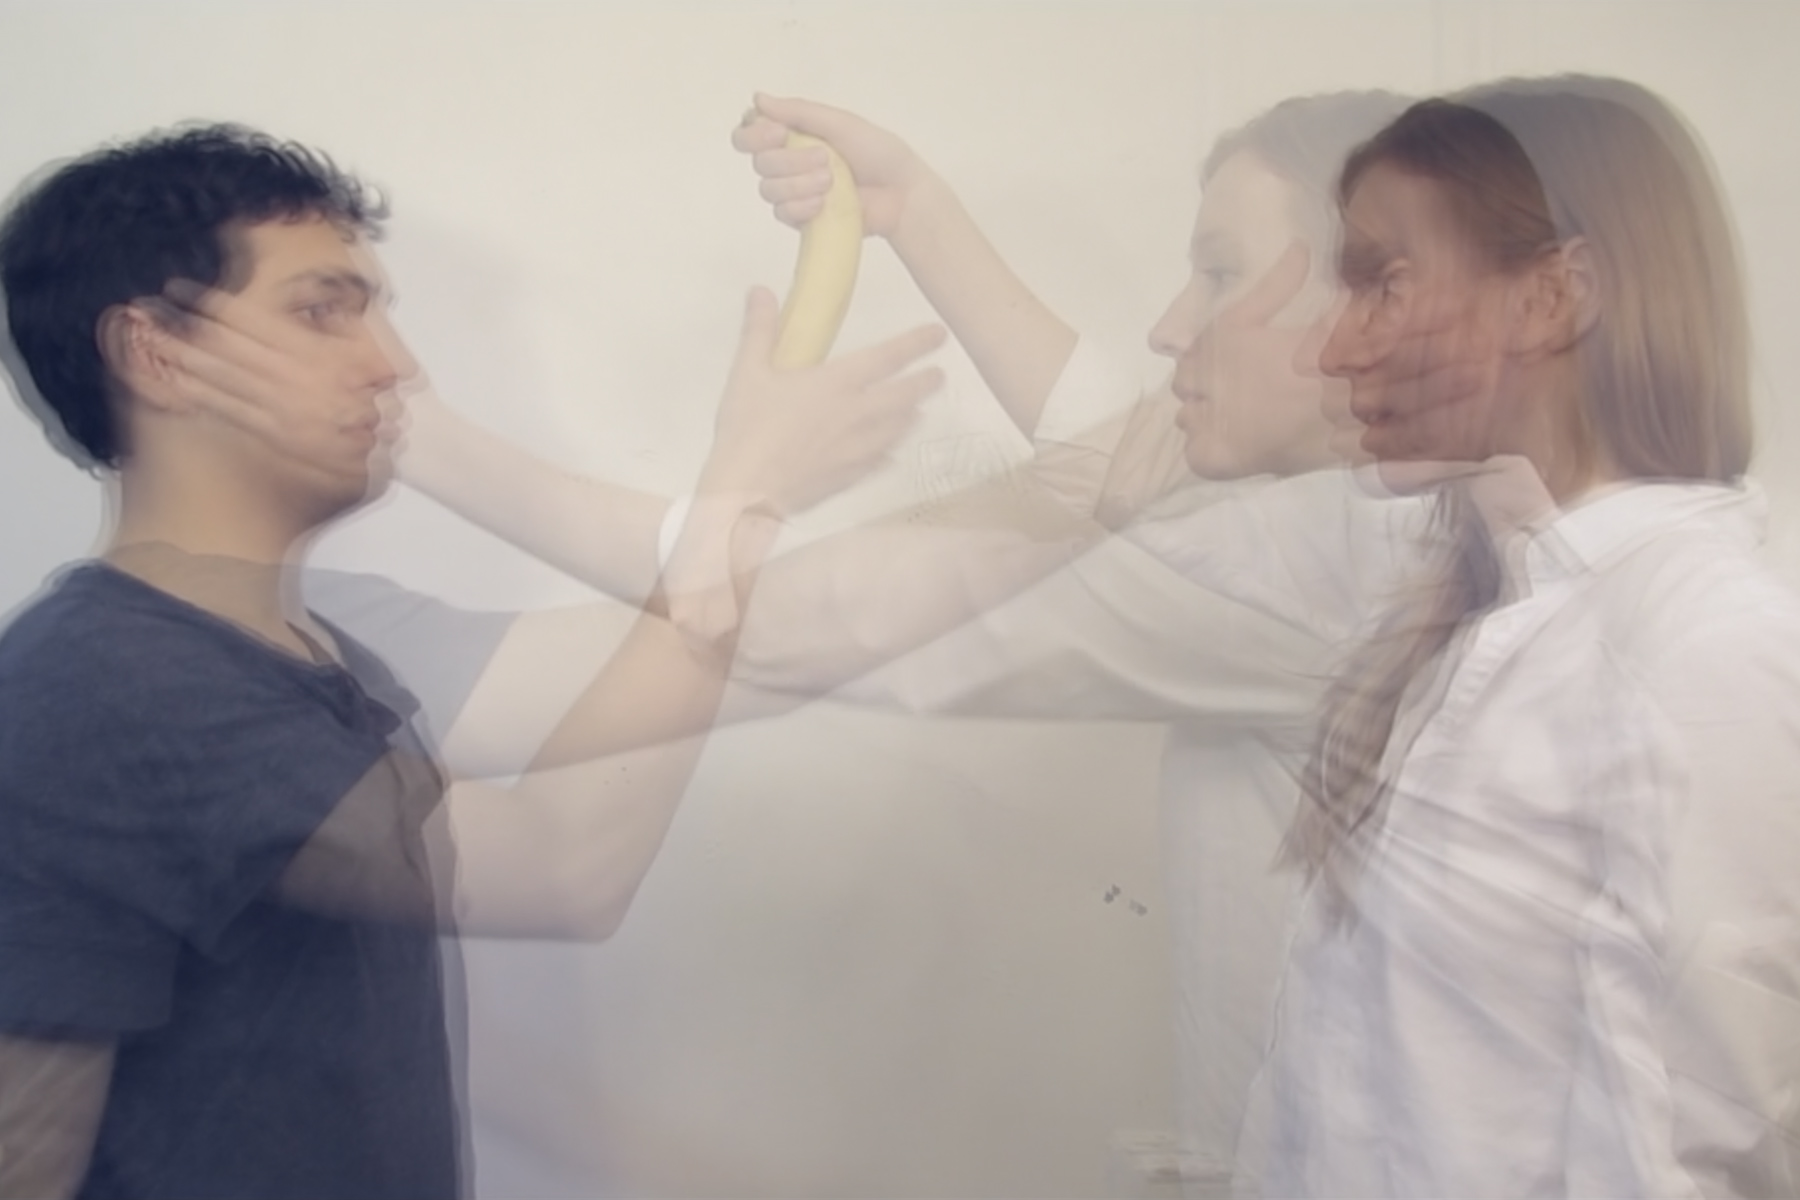 layered image depicting a man and woman at play